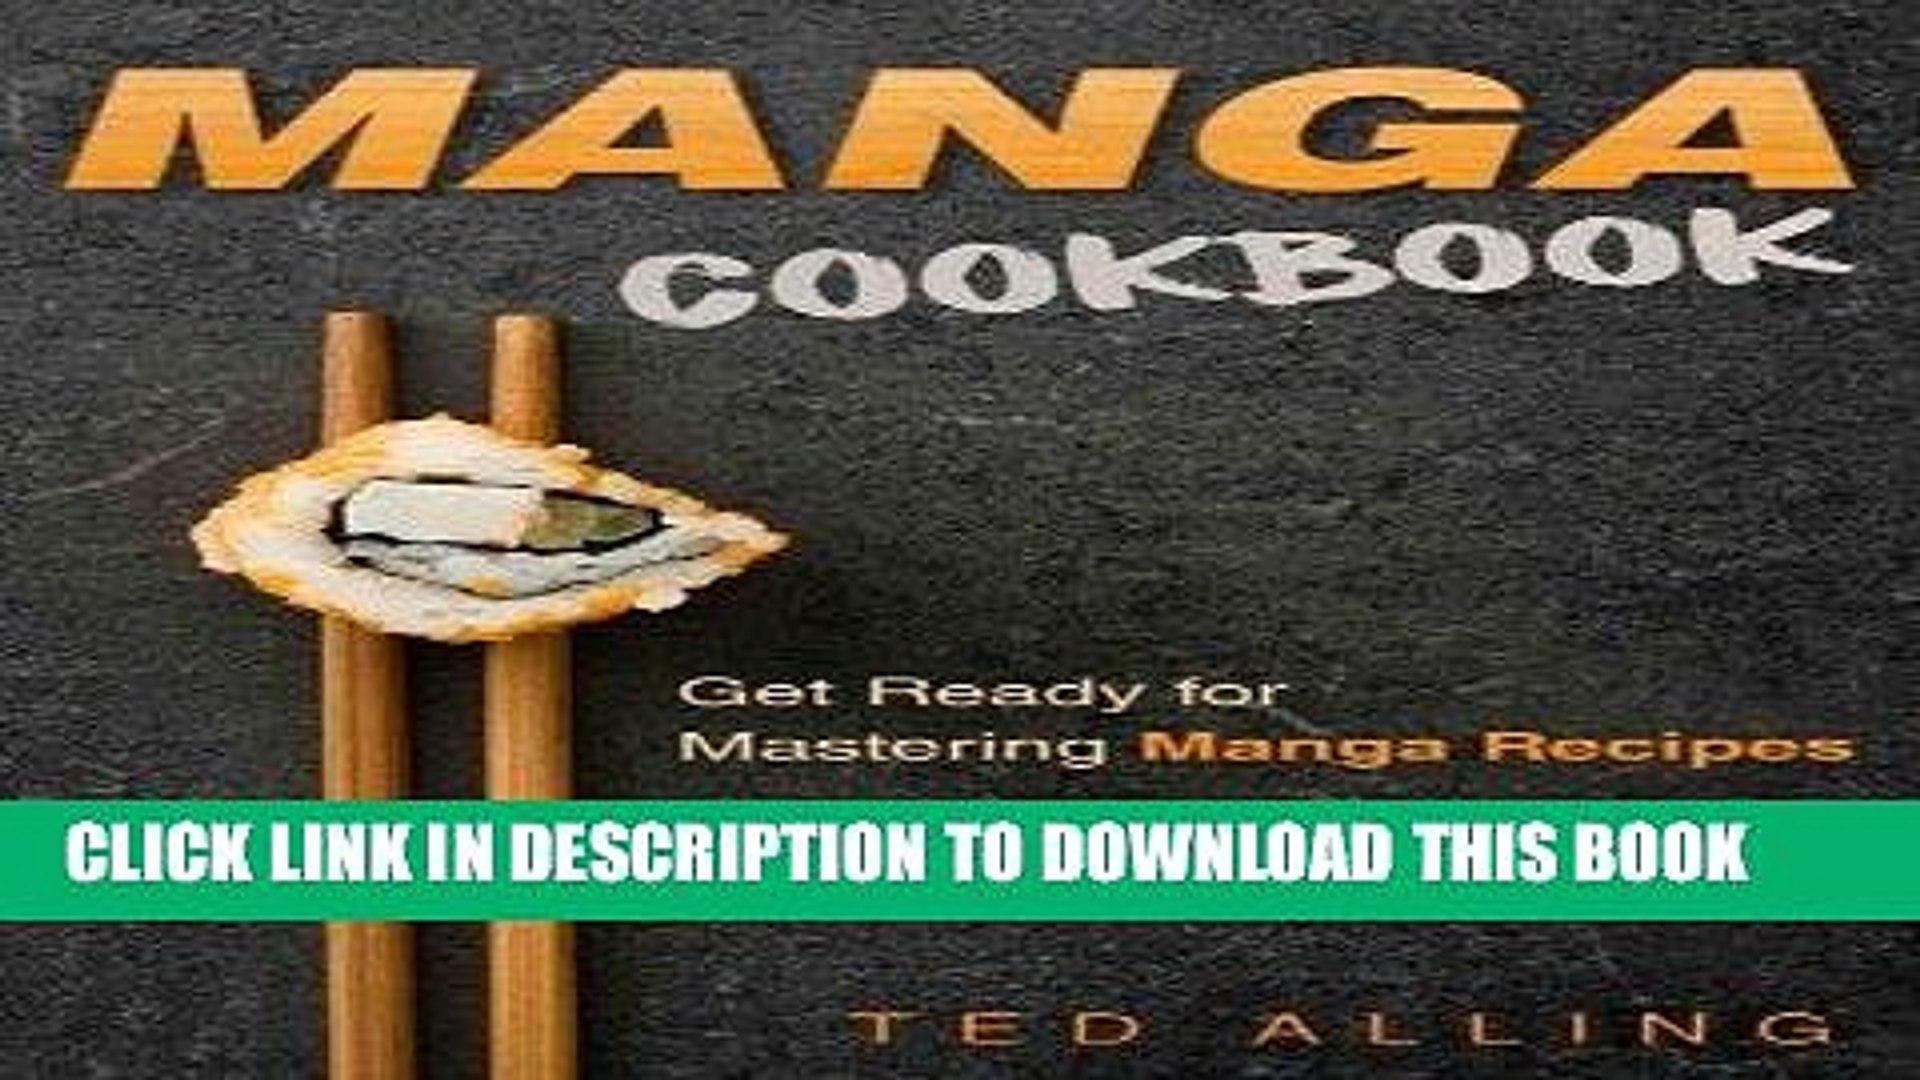 [PDF] Manga Cookbook - Get Ready for Mastering Manga Recipes: One of the Must Have Manga Books